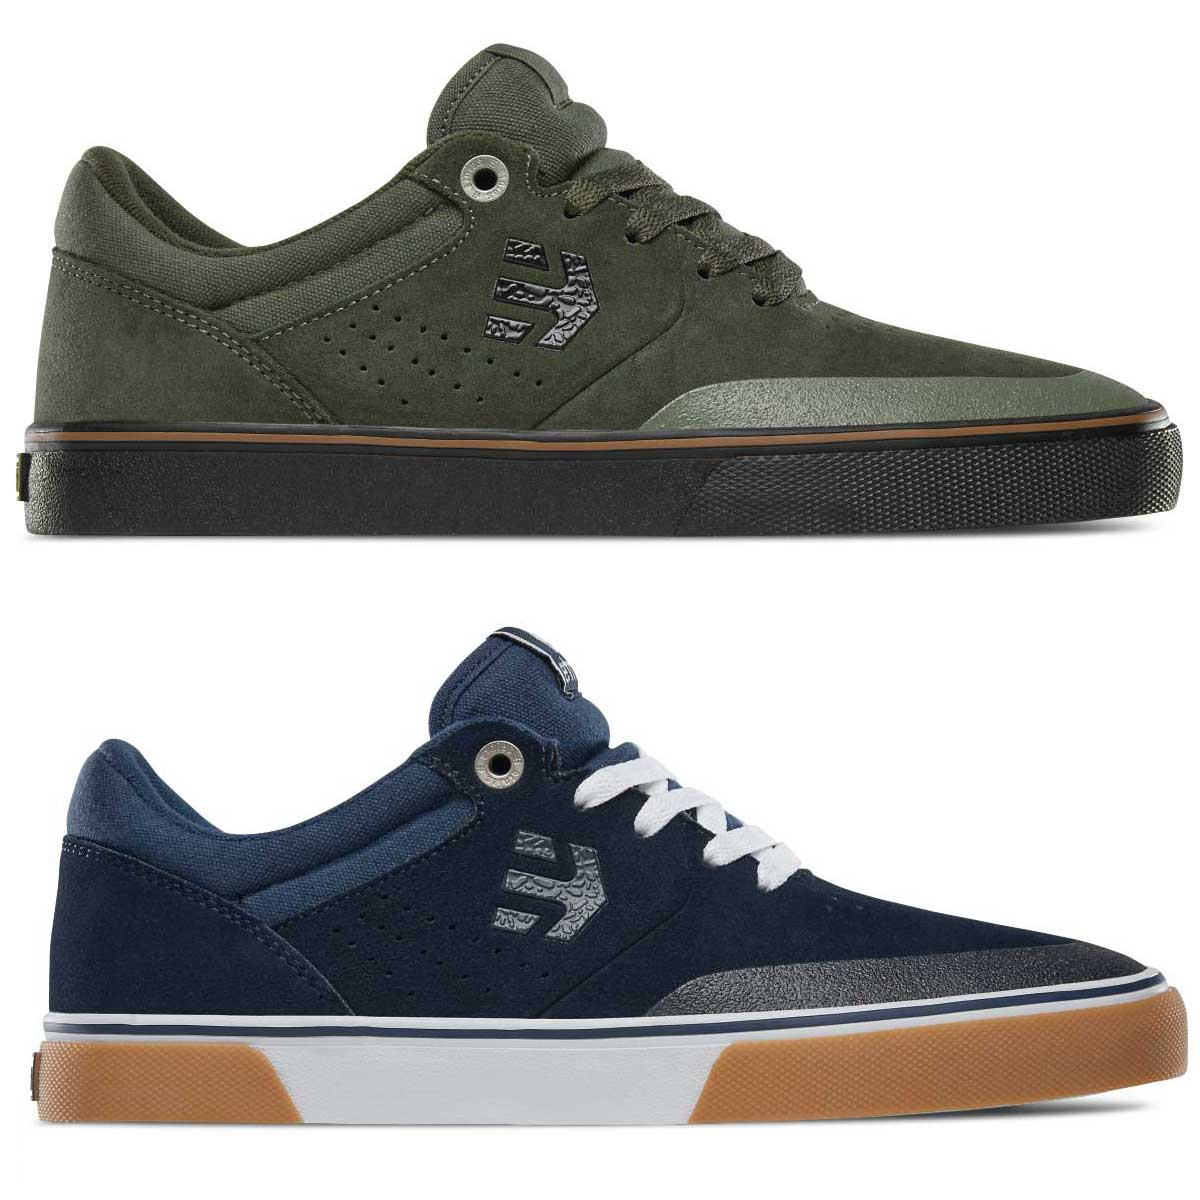 Sentinel Etnies Skate Shoes - Marana Vulc - Skateboarding Trainers Green  Black Navy Gum 1a241ab4b